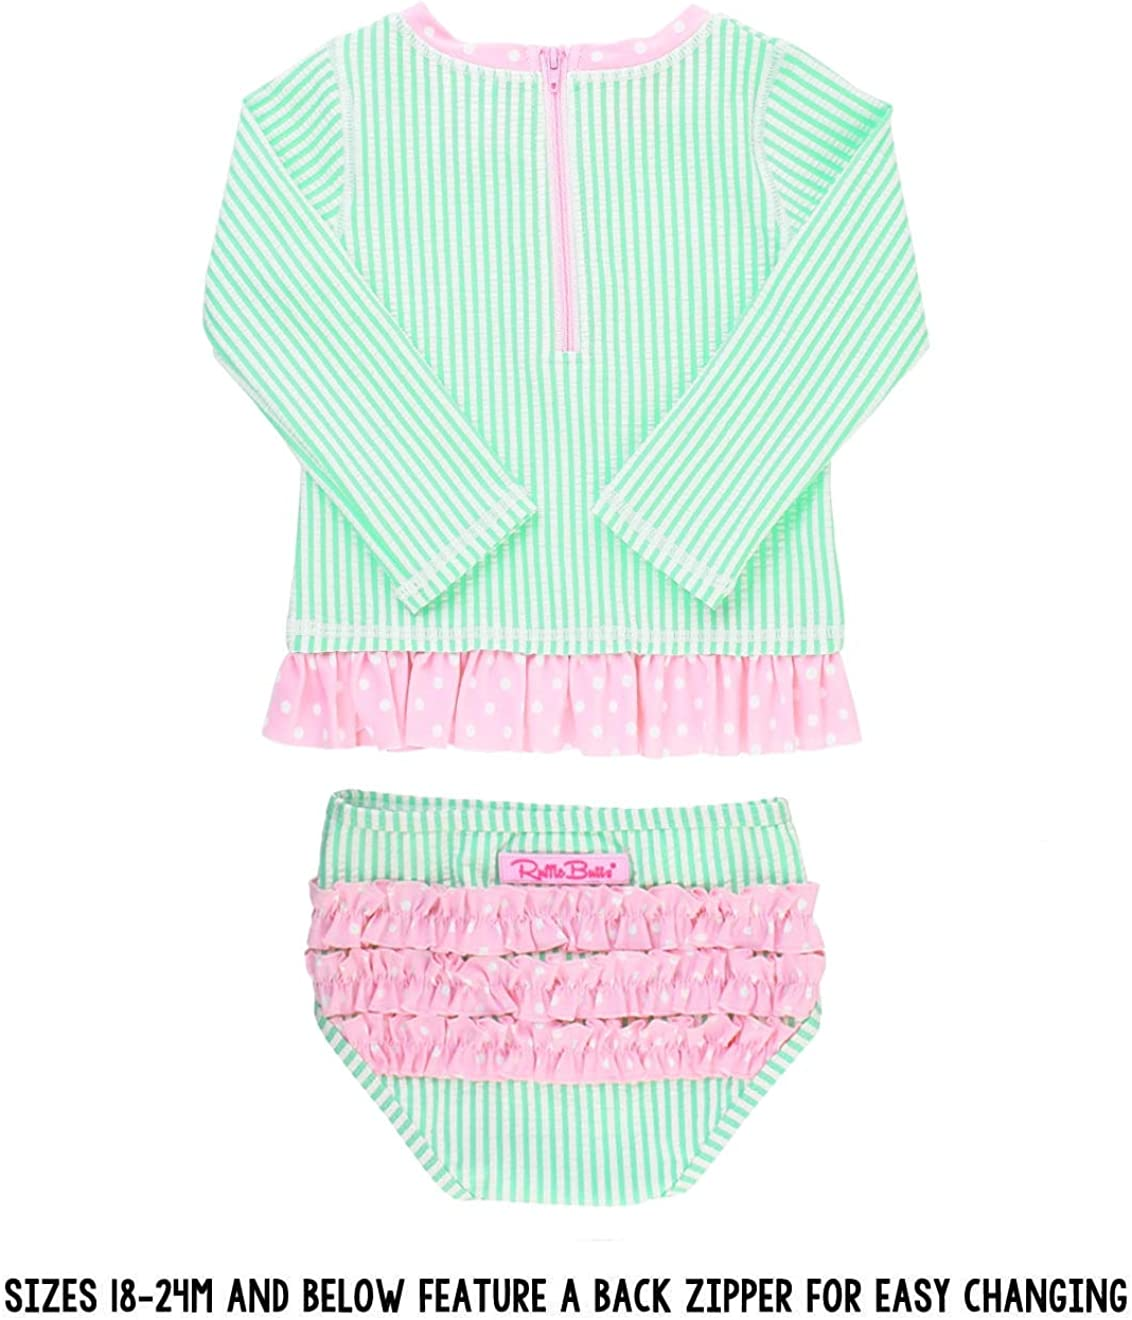 Long Sleeve Bikini with UPF 50 Sun Protection RuffleButts Baby//Toddler Girls Rash Guard 2-Piece Swimsuit Set